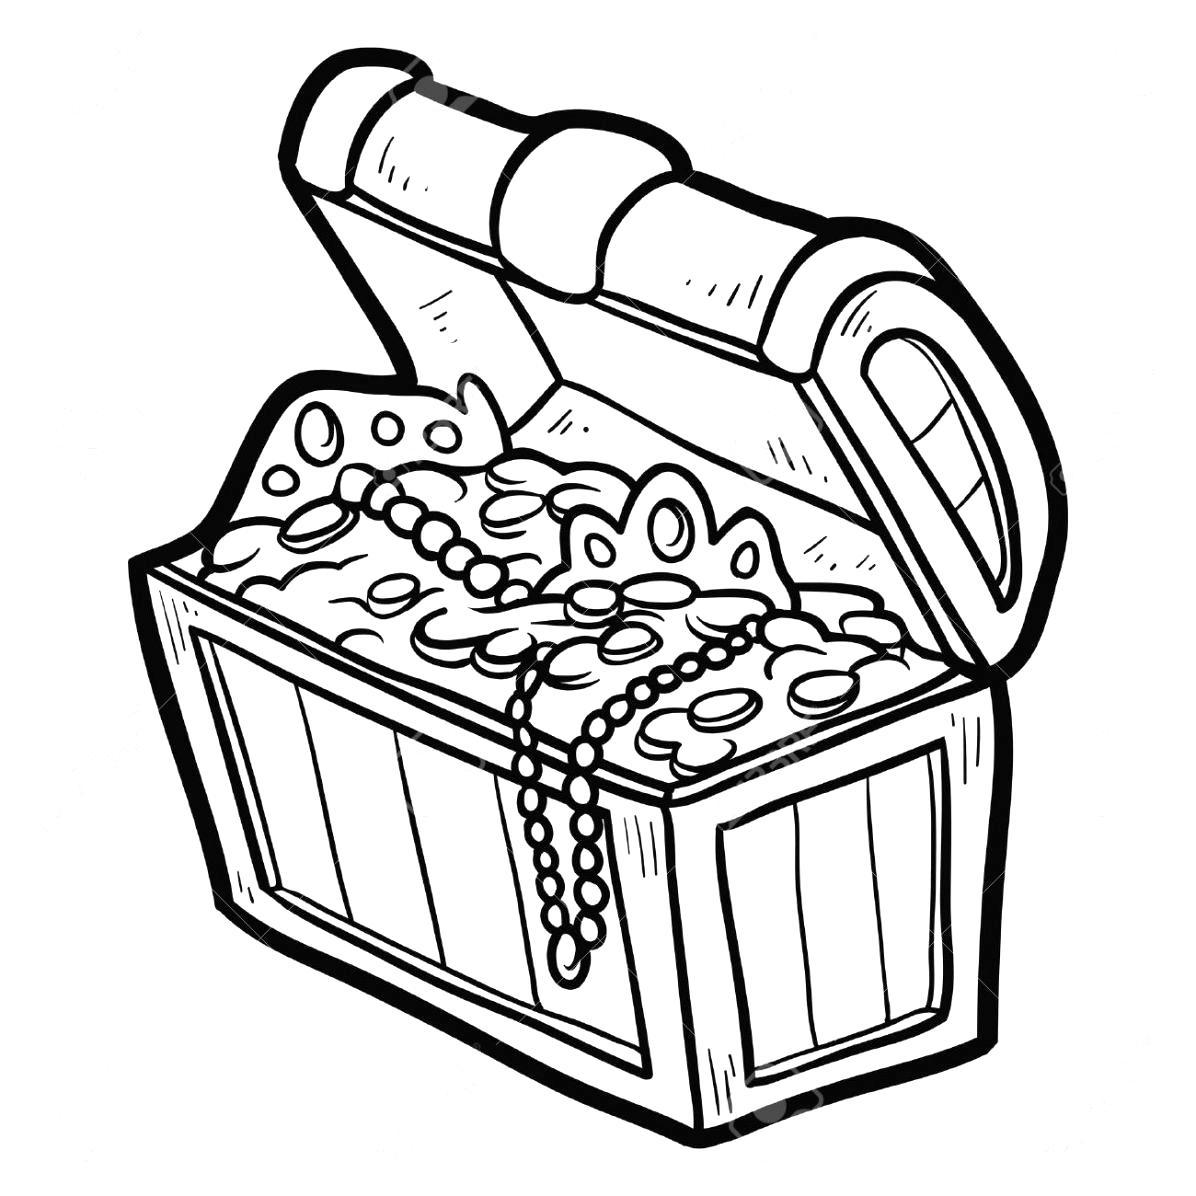 Pirate clipart black and white treasure map graphic transparent Treasure Chest Black And White | Free download best Treasure ... graphic transparent